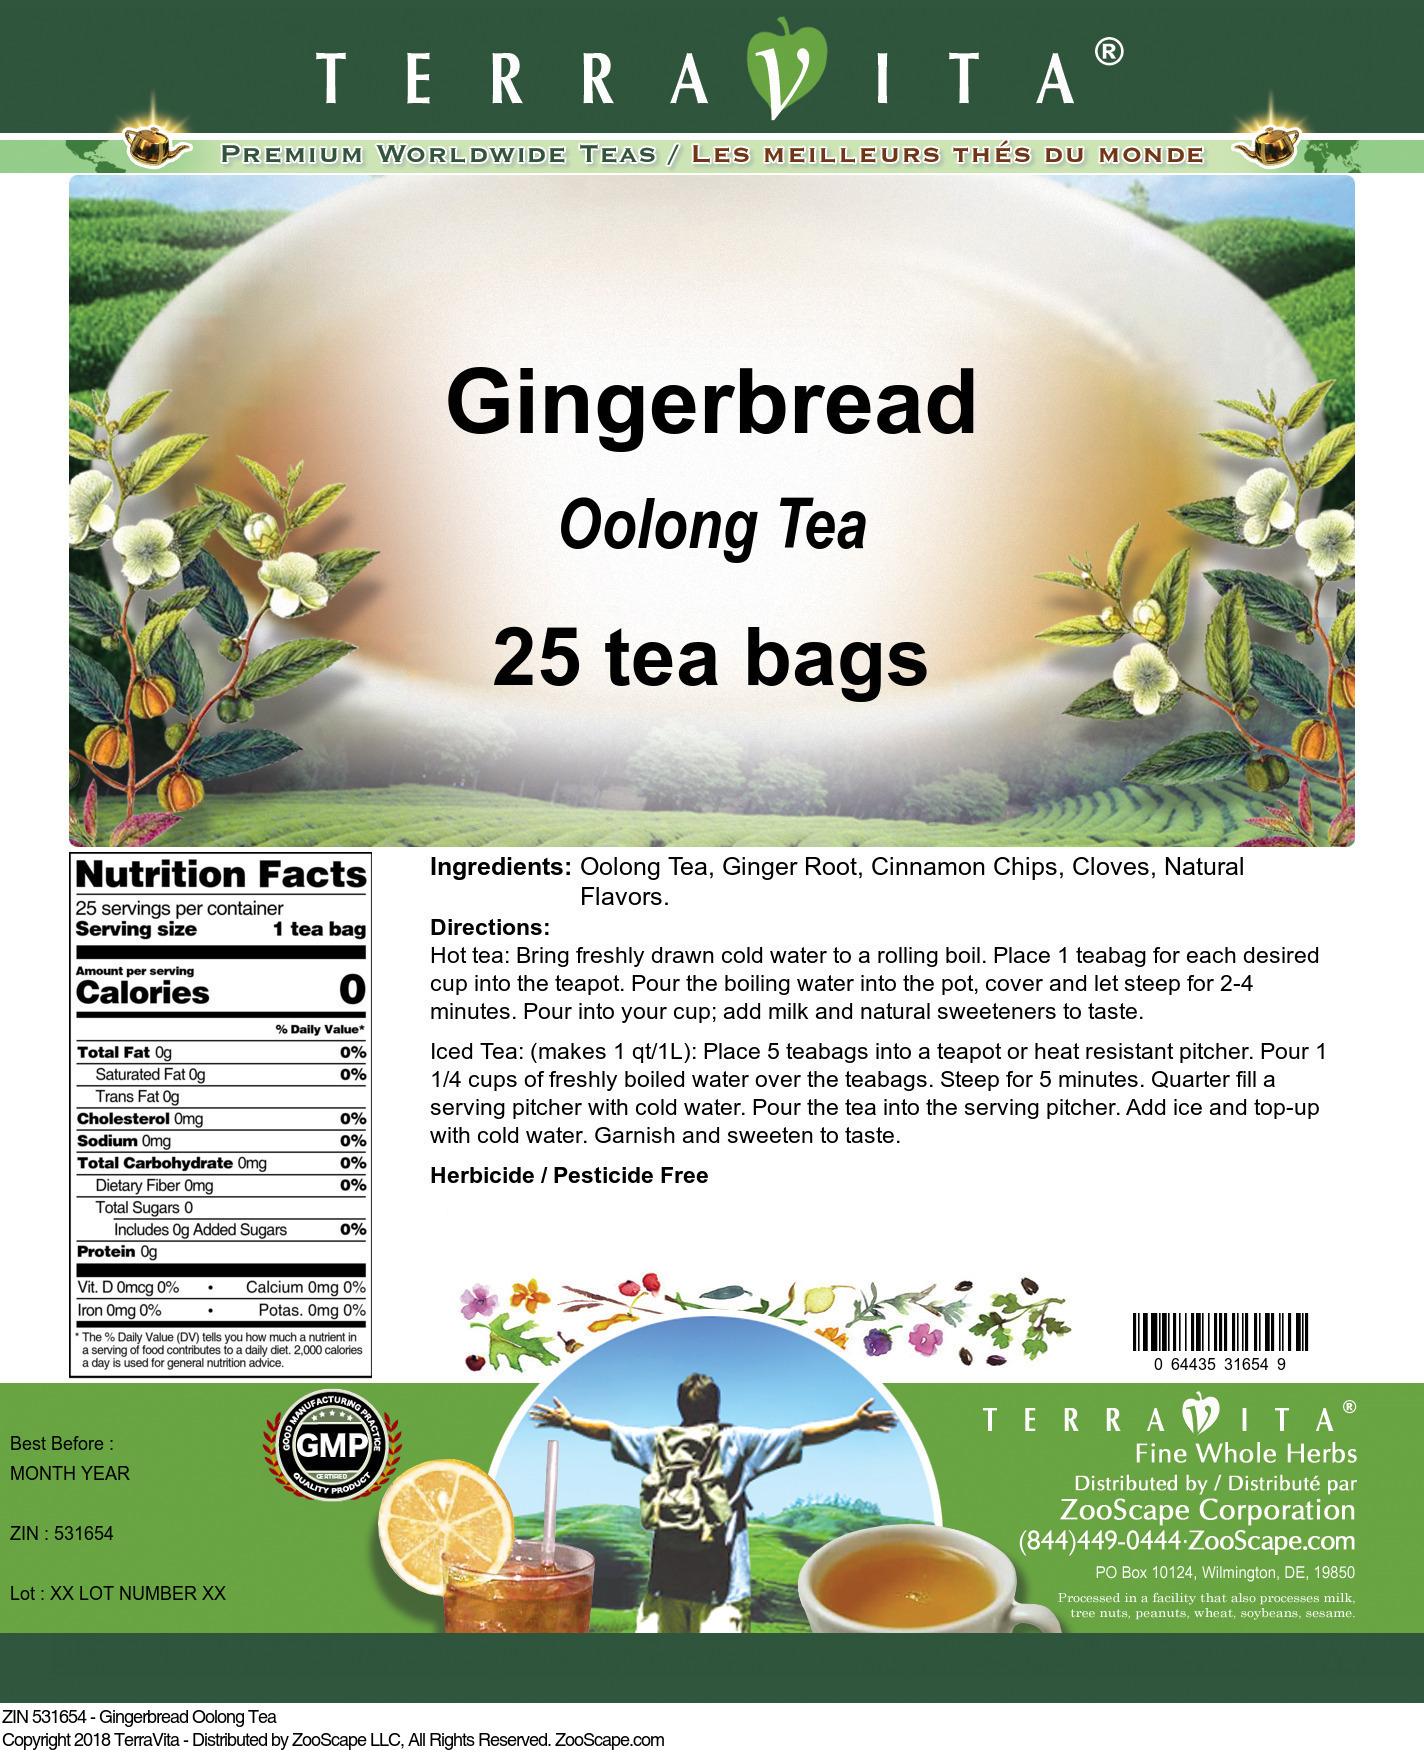 Gingerbread Oolong Tea